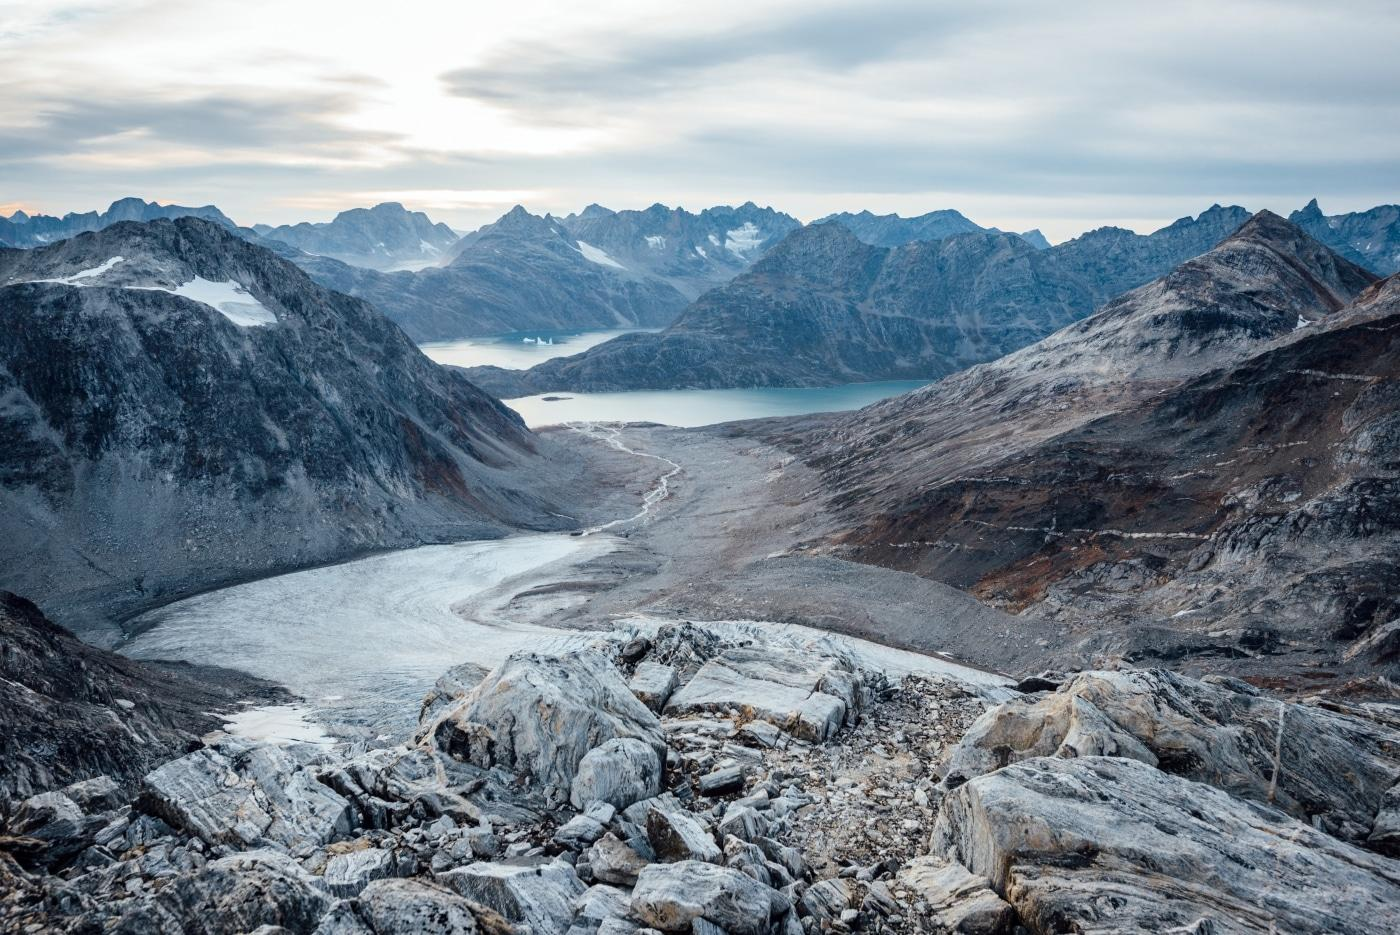 Photo by Chris Brin Lee Jr. - Visit Greenland